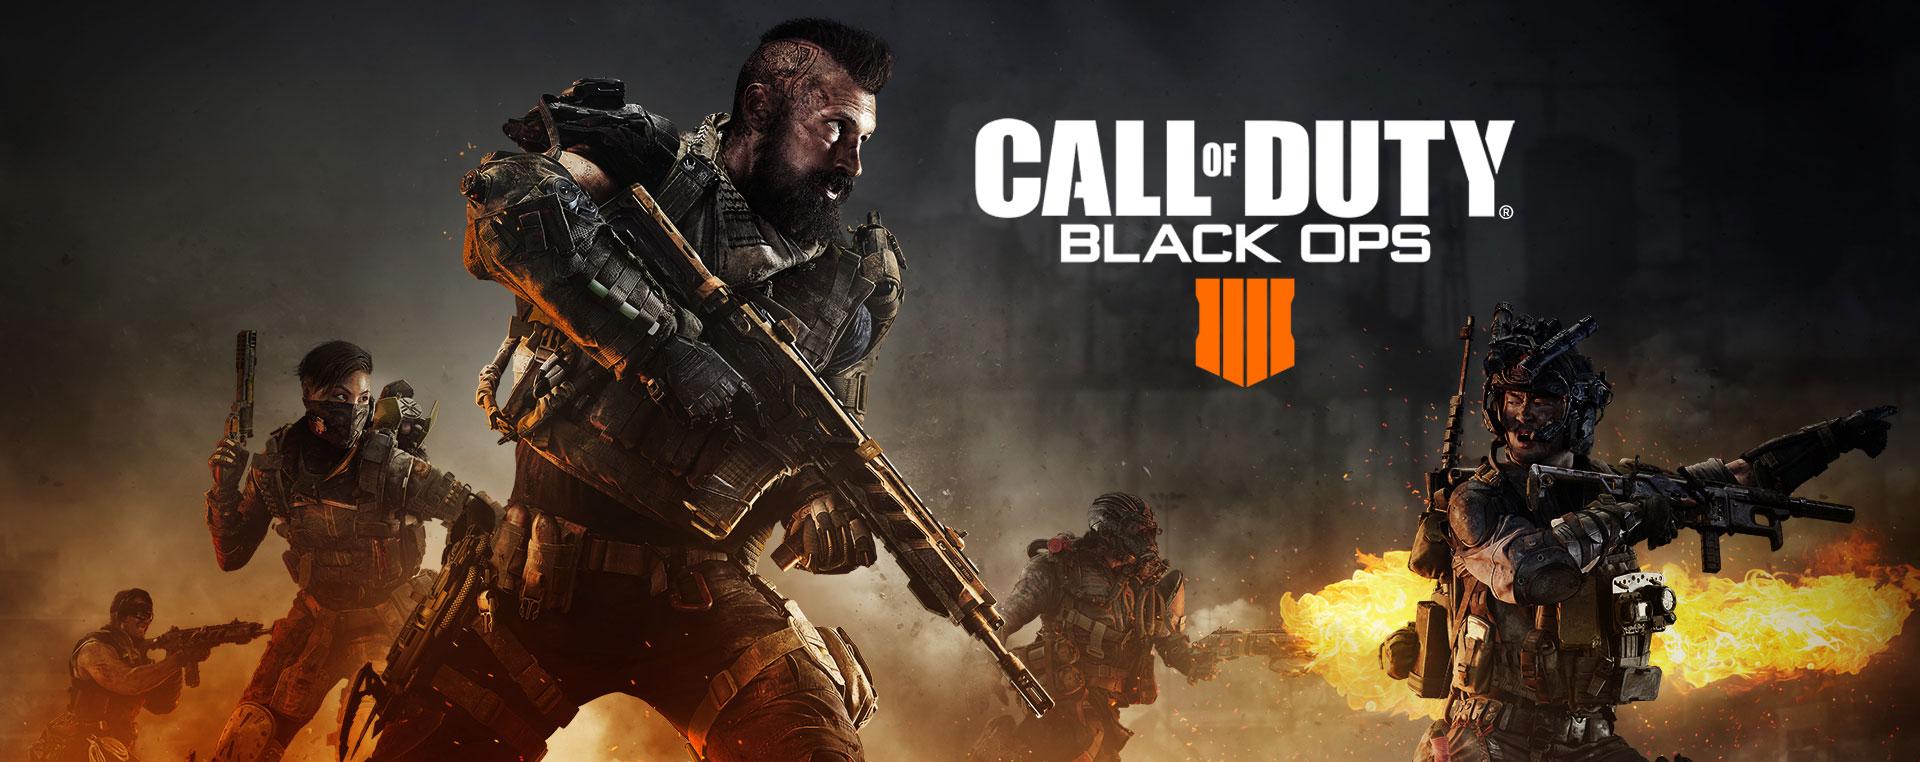 بخشهای مهم Call of Duty: Black Ops 4، Blackout